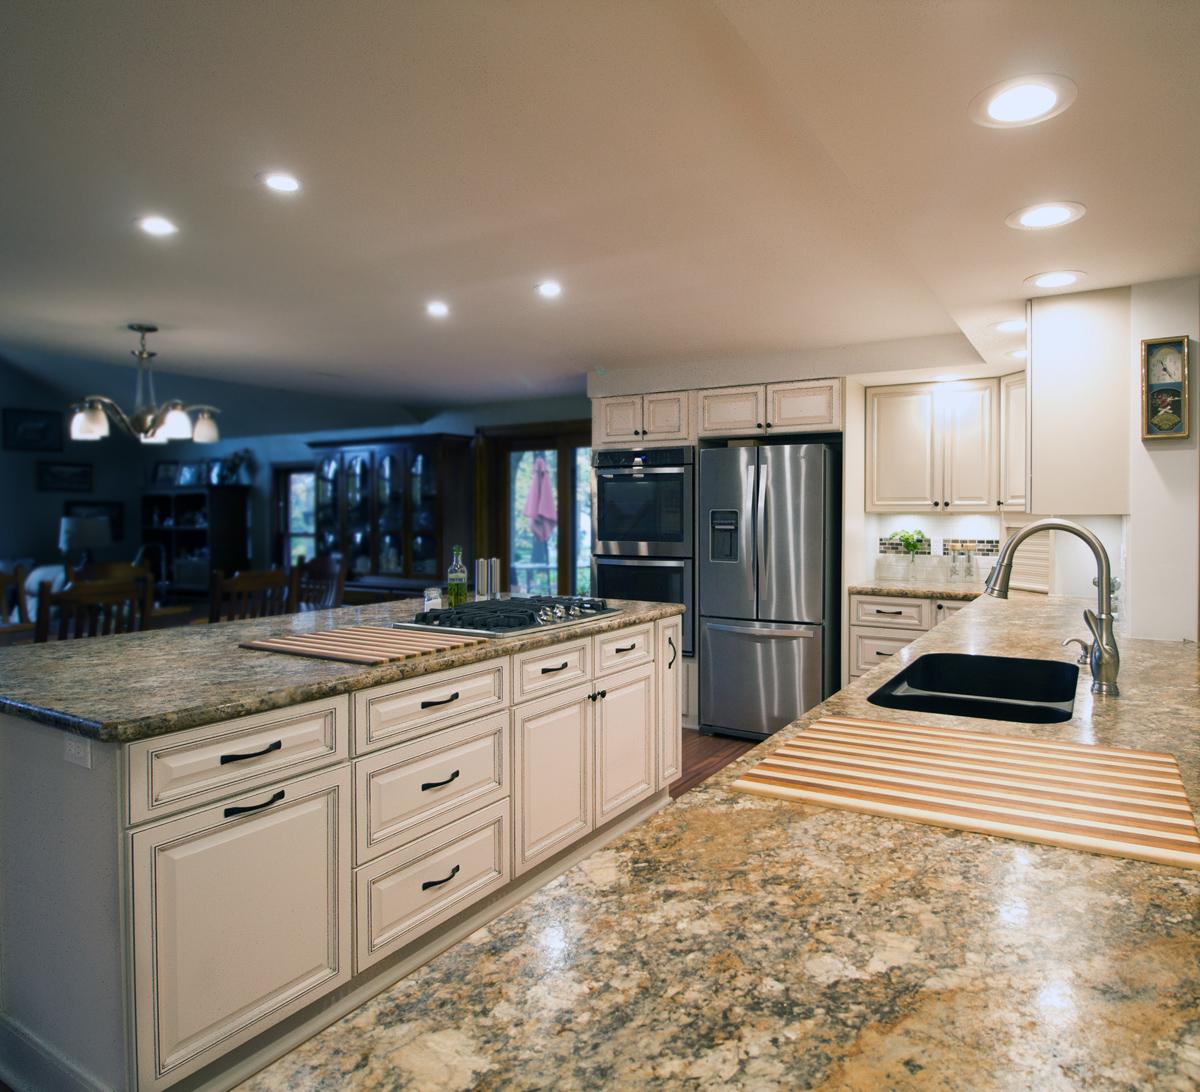 Kitchen_2_Custom_Cabinet_Island_Counter